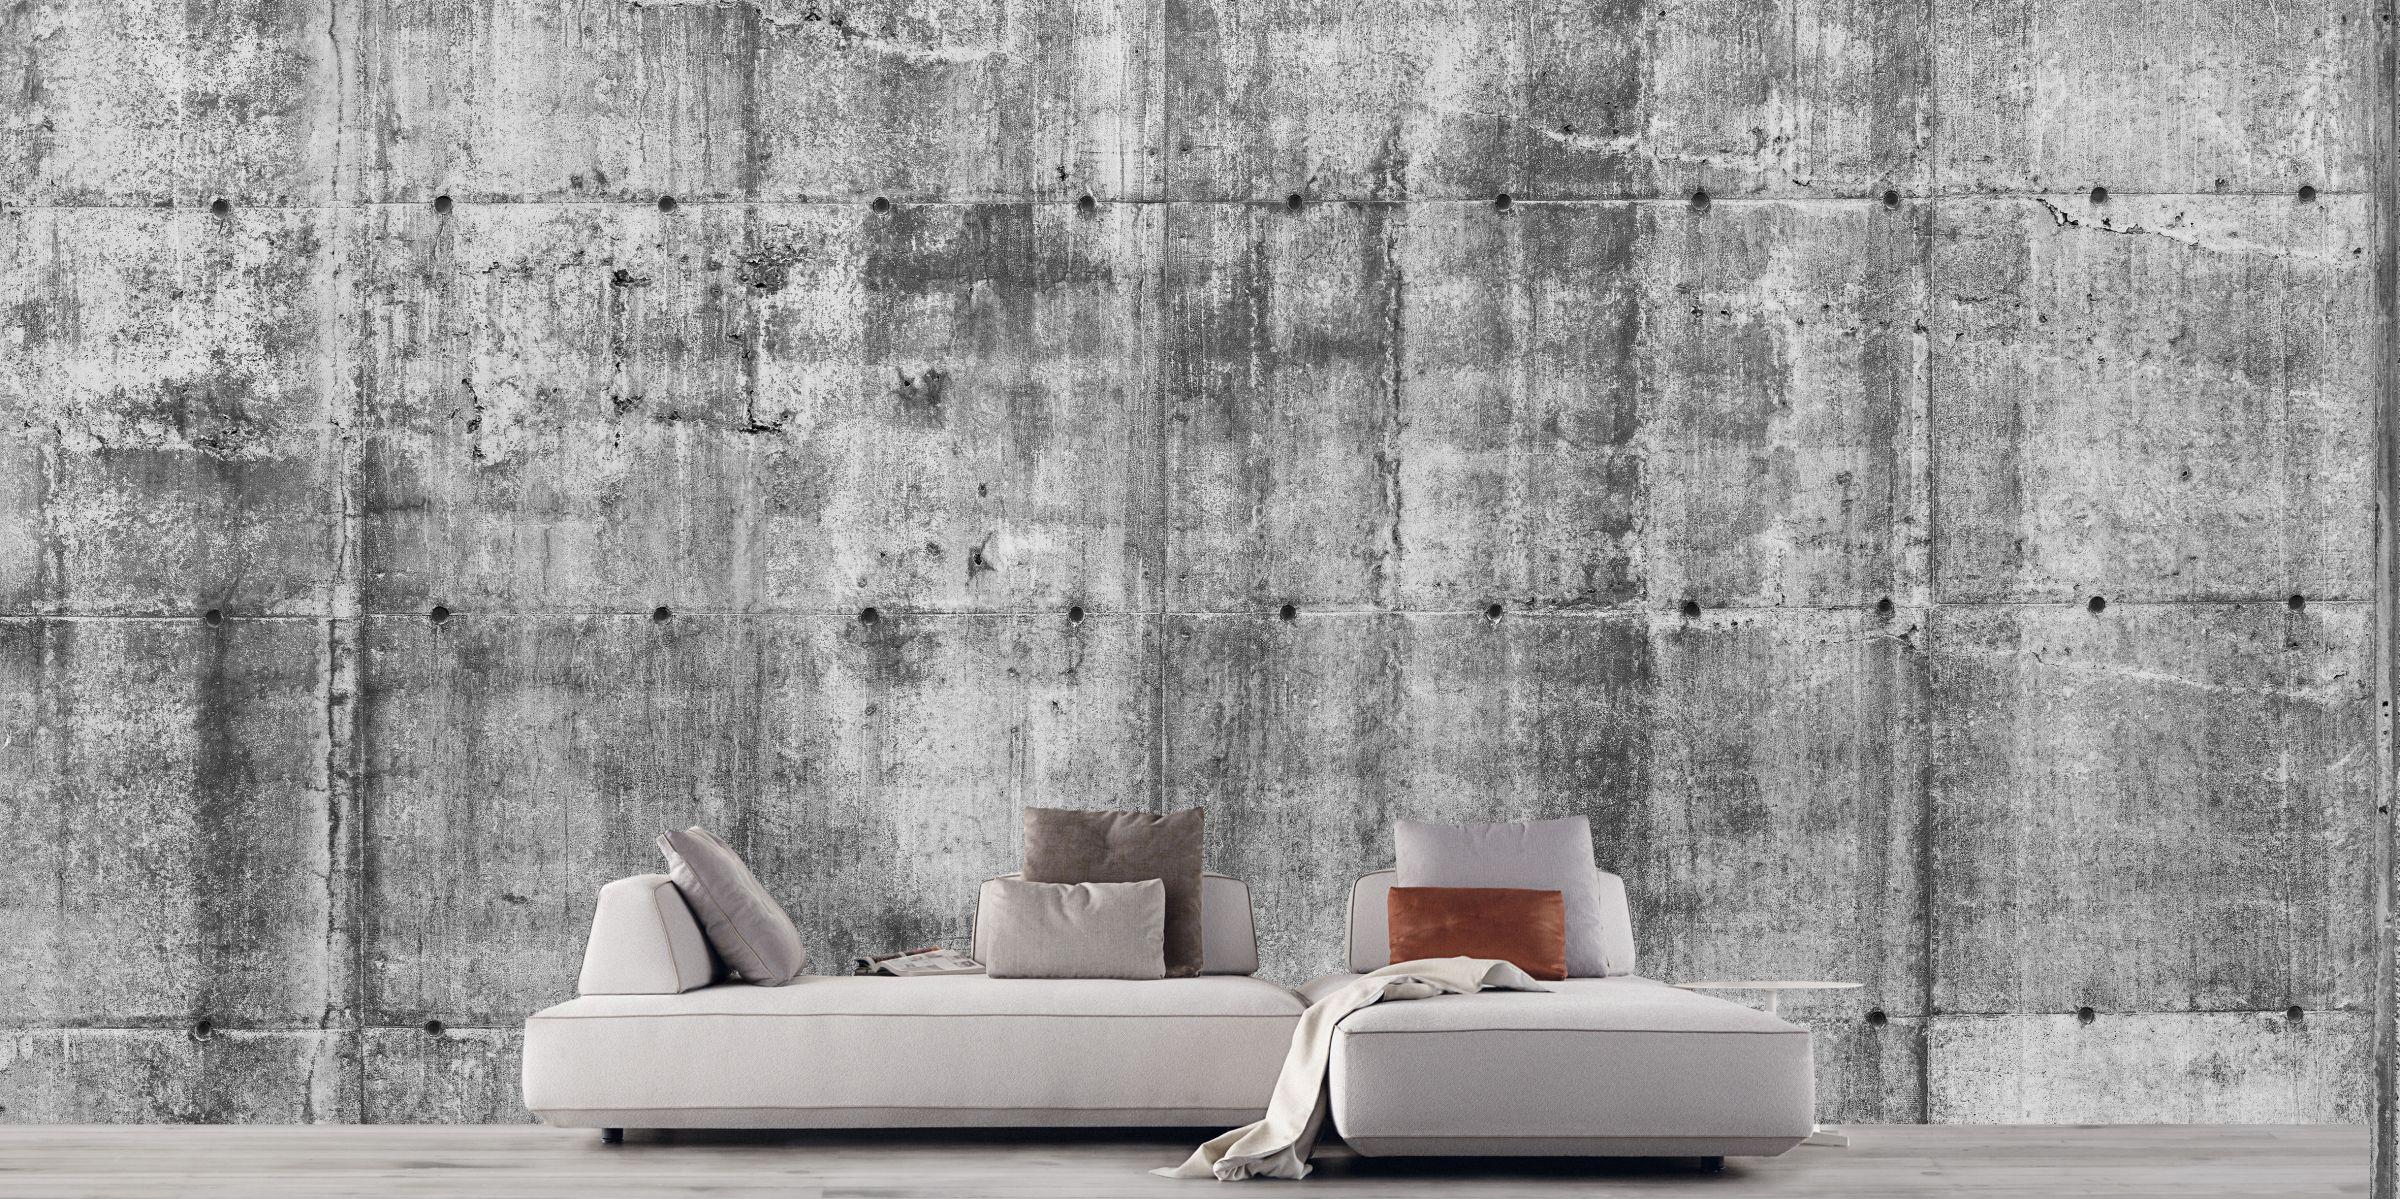 CW19_600x300_sofa.jpg